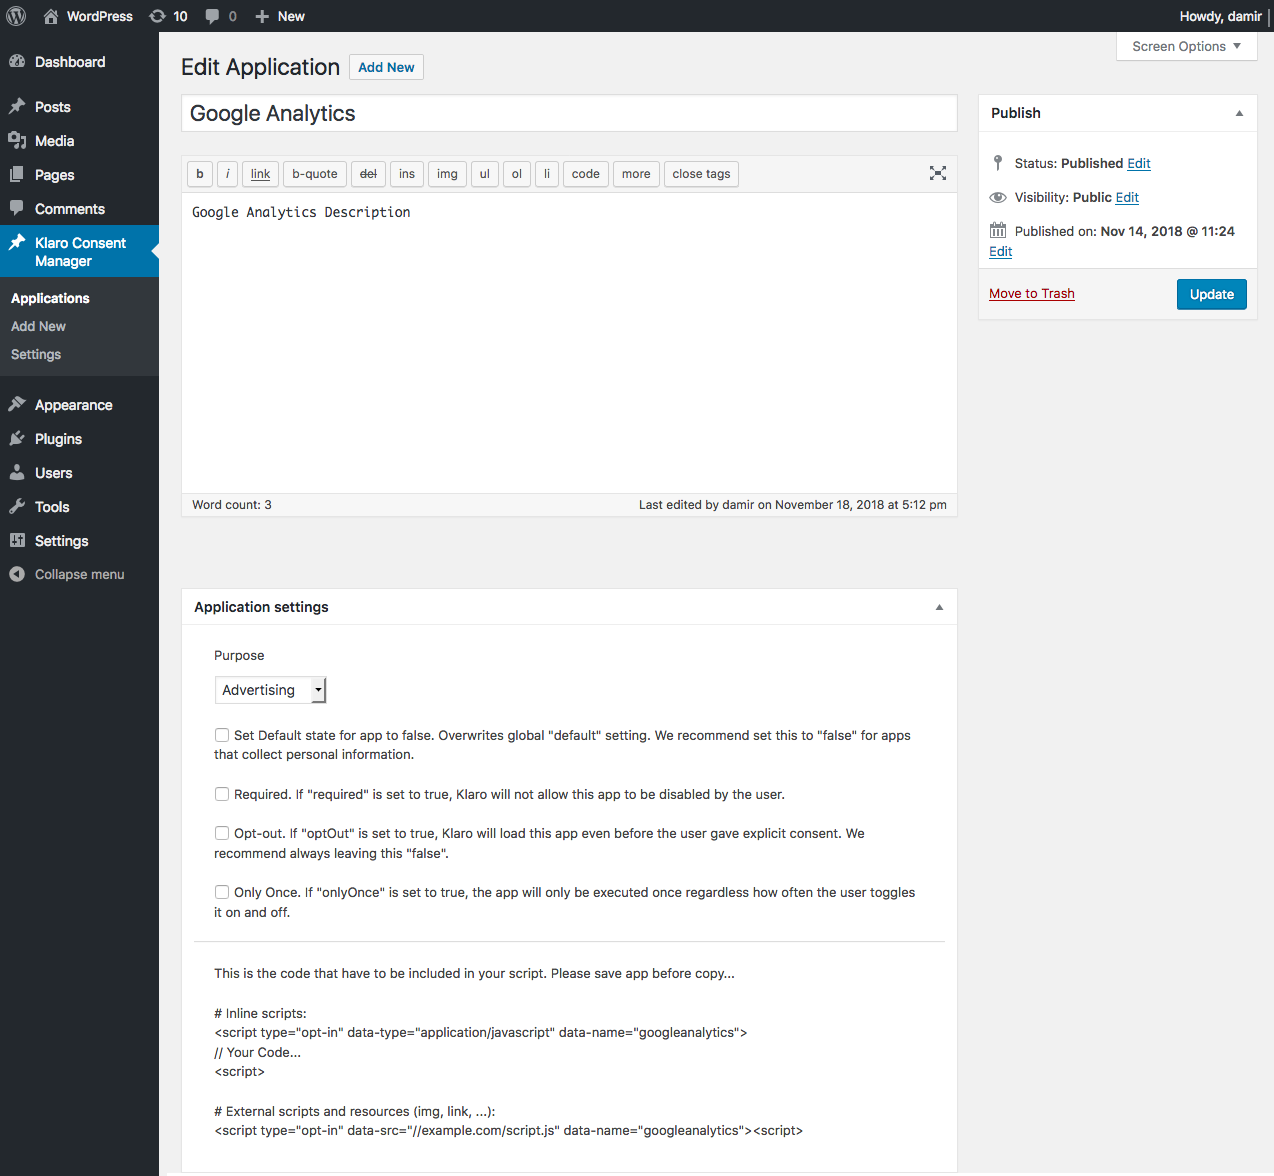 screenshot-5.png shows application in edit mode.